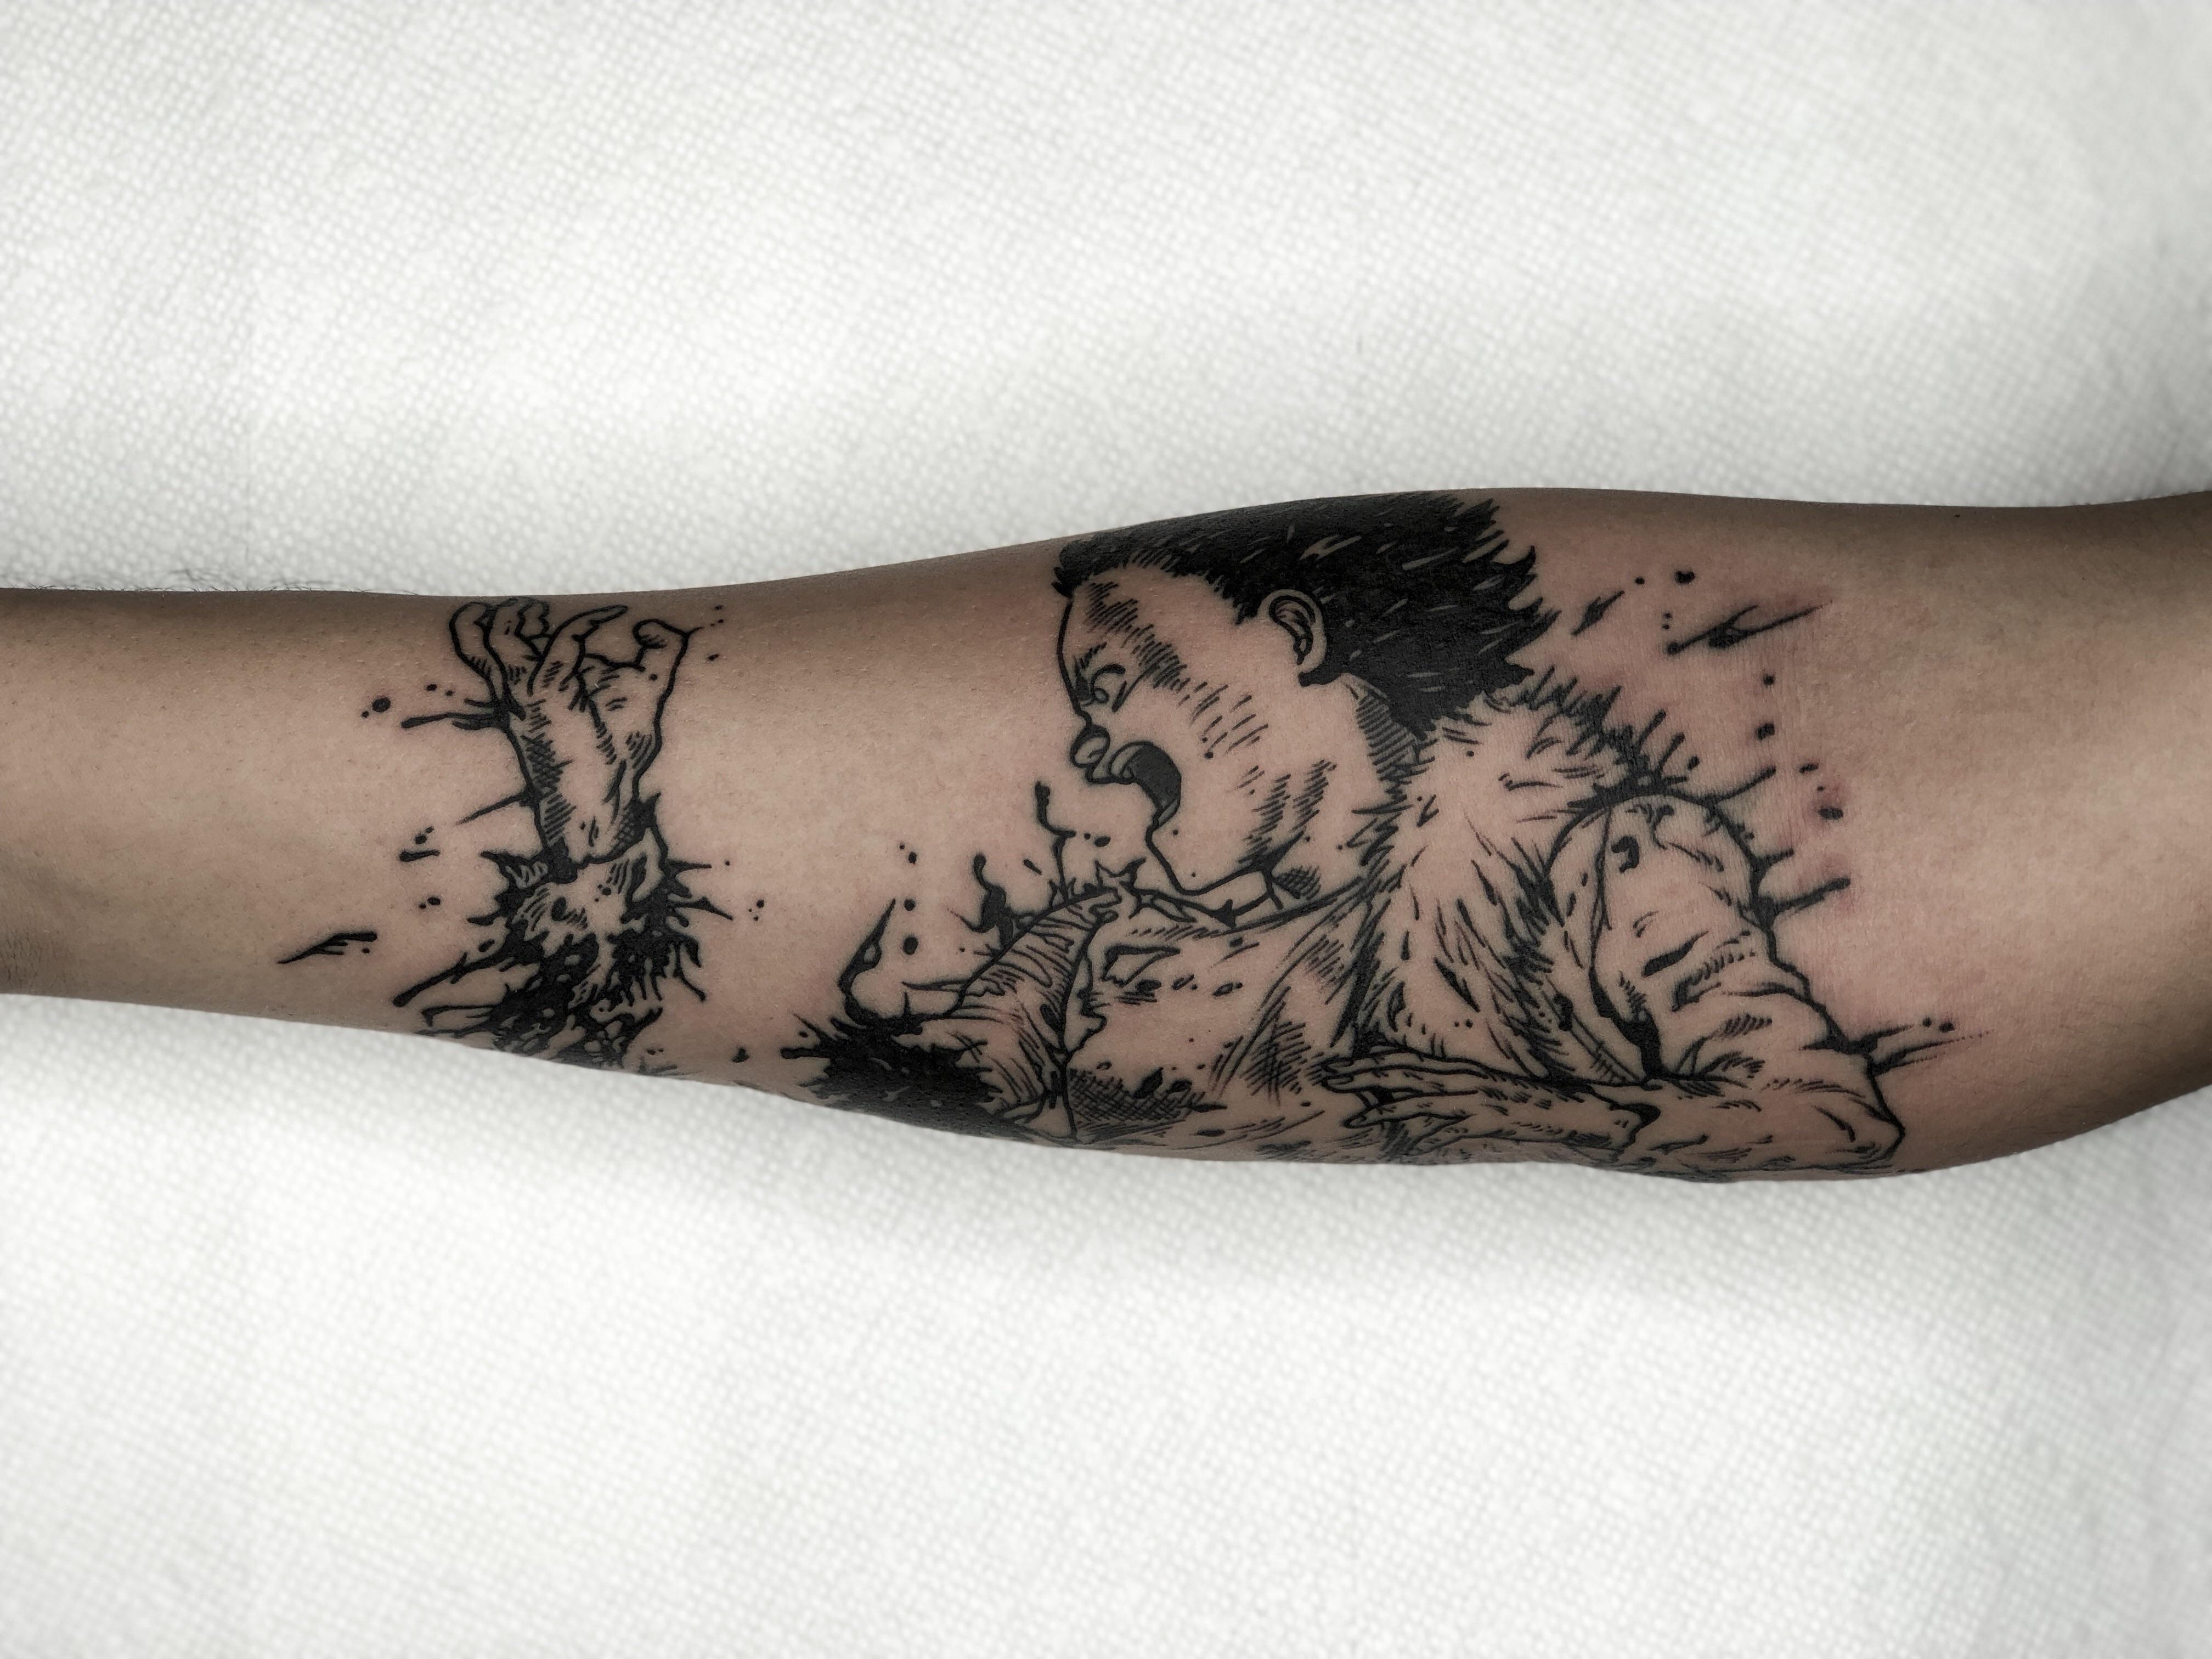 Akira Tetsuo Tattoo By Jose Arvizu At Ace Of Hearts Tattoo In Long Beach Ca Tattoos Akira Tetsuo Body Art Tattoos